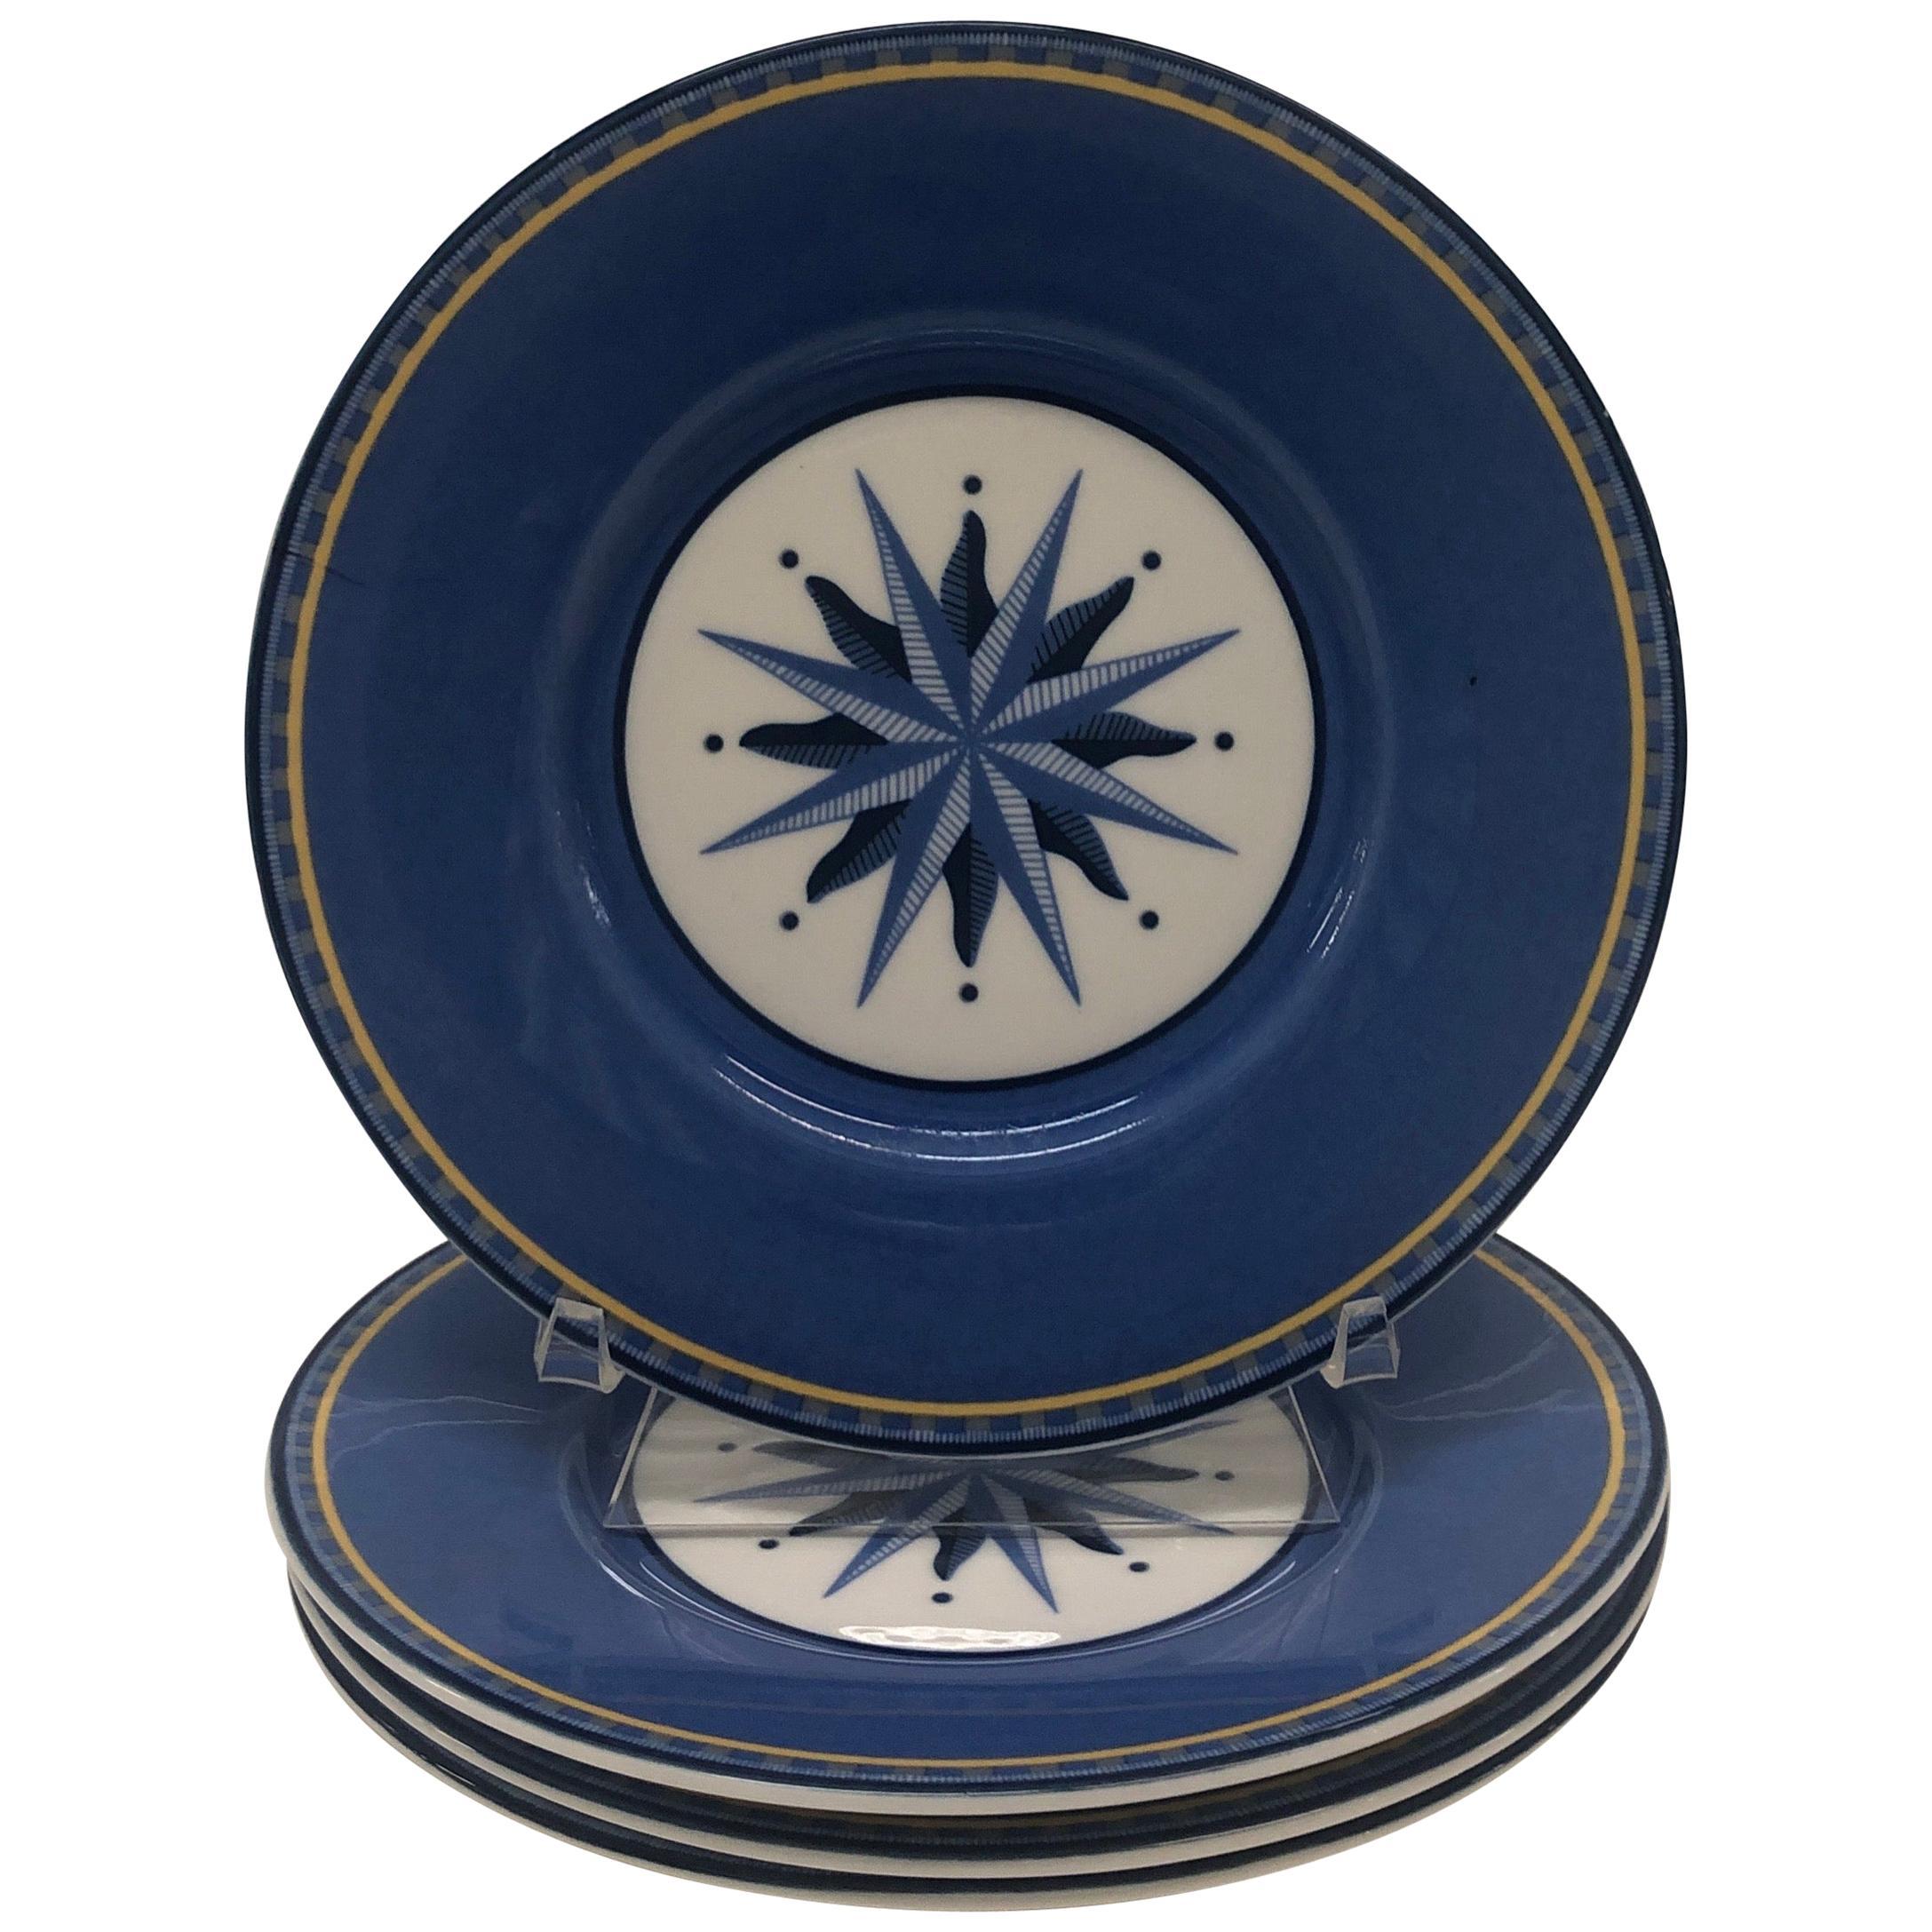 Set of (4) Porcelain Dessert Blue and White Dessert Plates